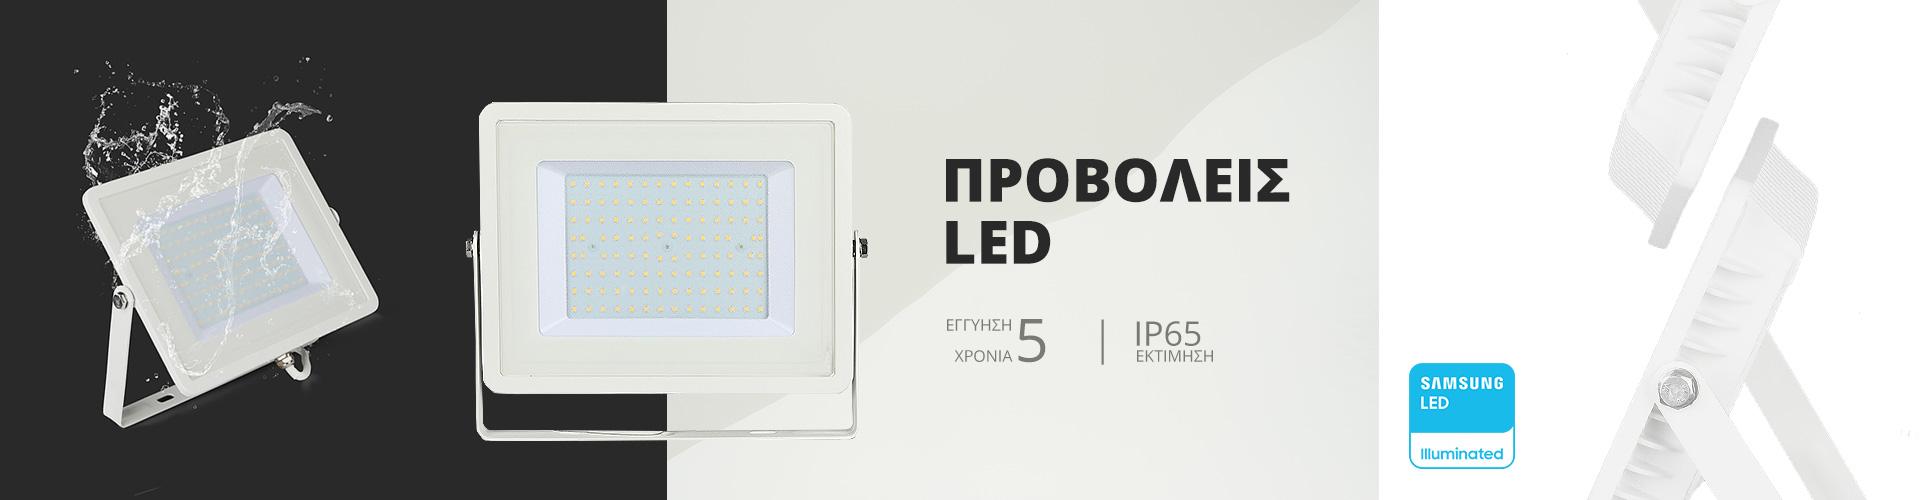 1-floodlights-gr